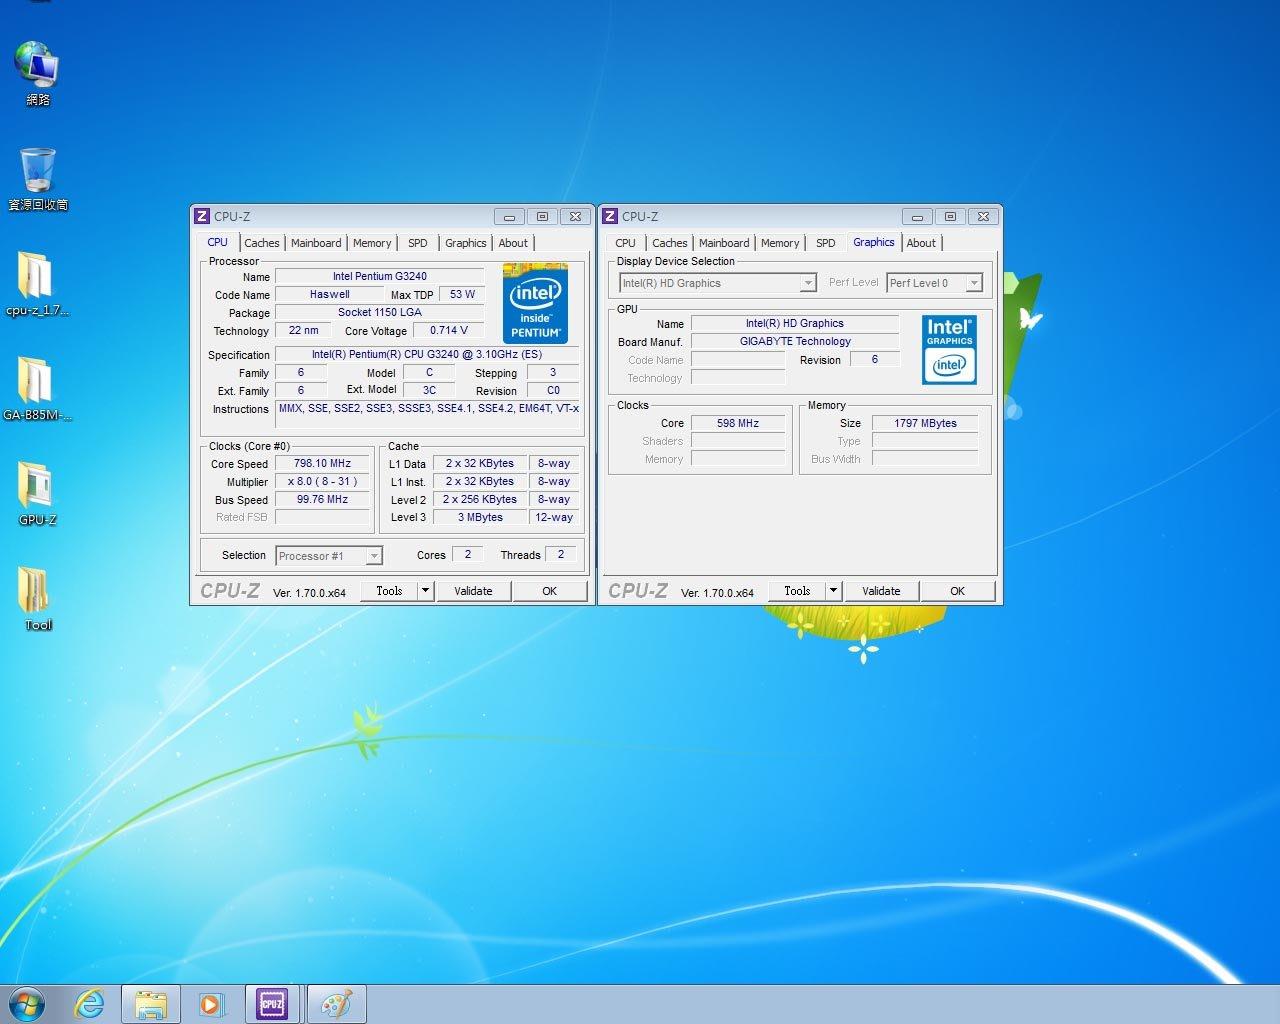 G3240 CPU (1150腳位)